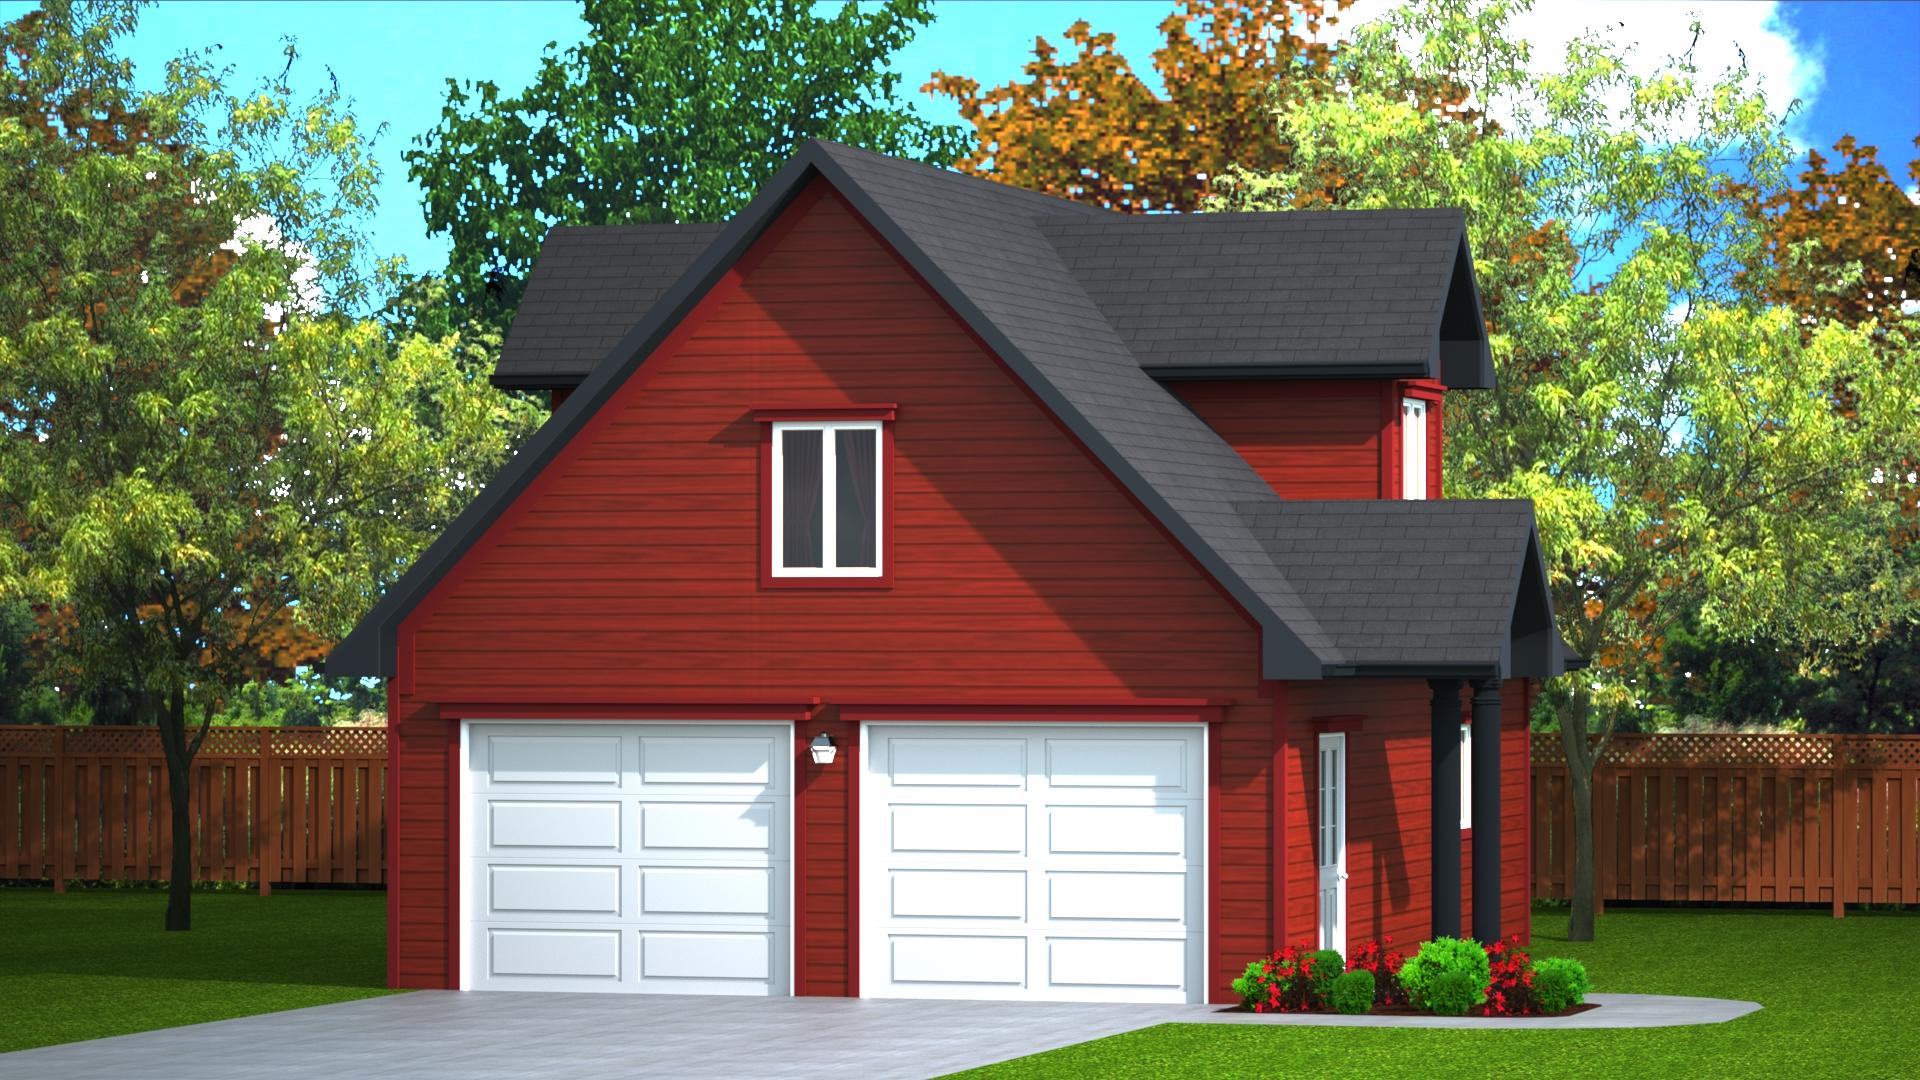 720 sq.ft. timber mart 2 car garage exterior render